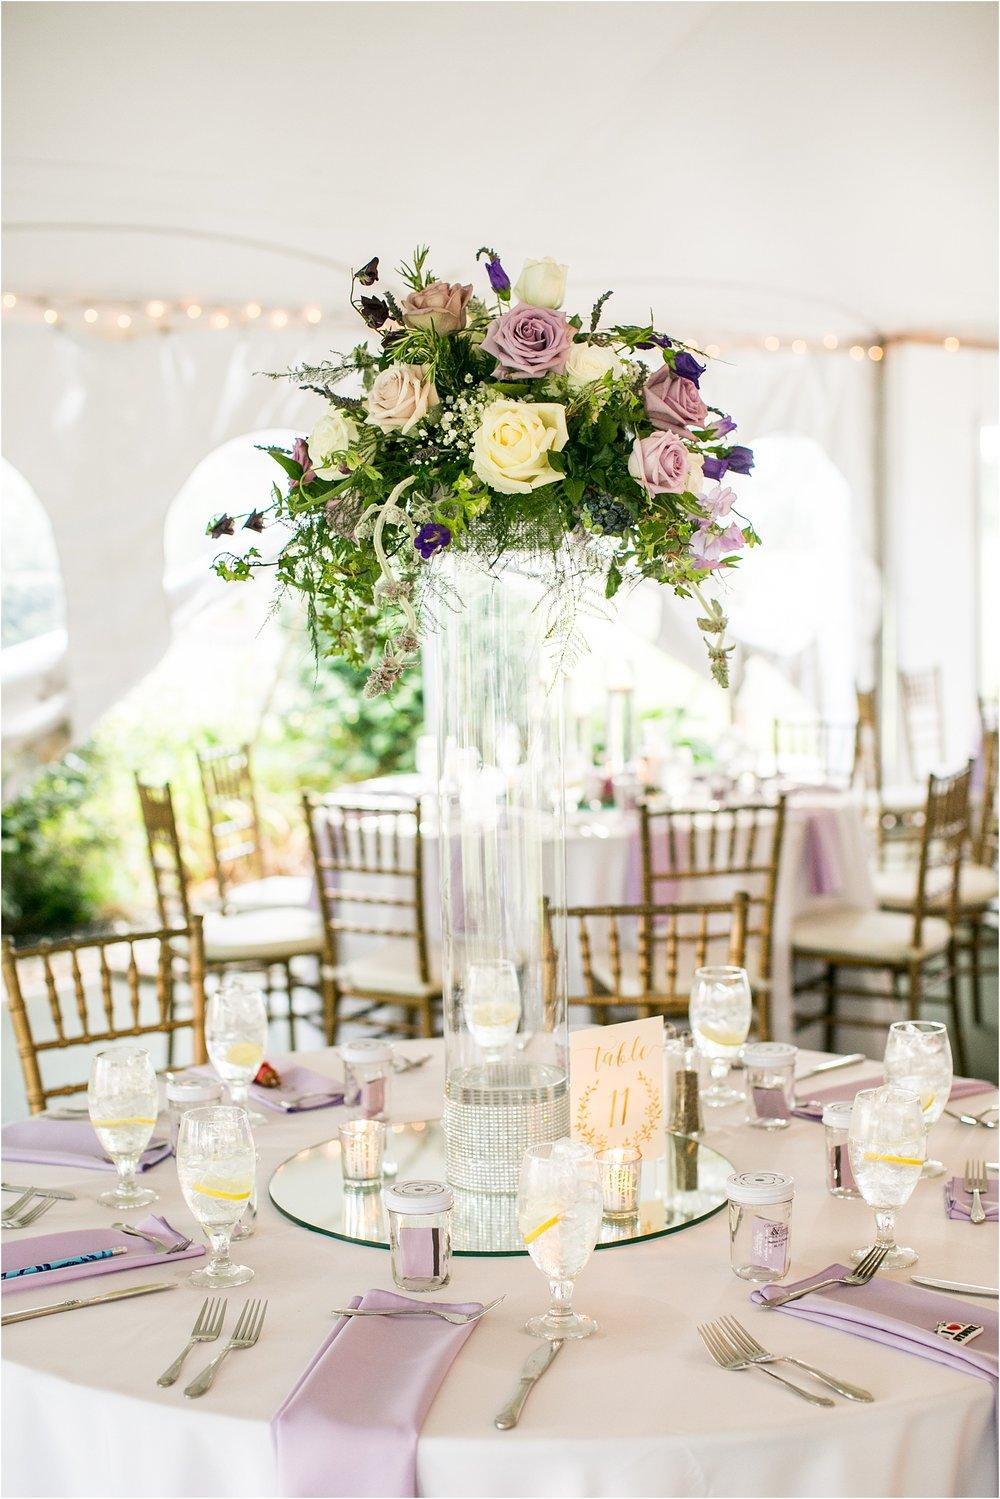 Lumley Stone Manor Wedding Living Radiant Photography photos_0174.jpg